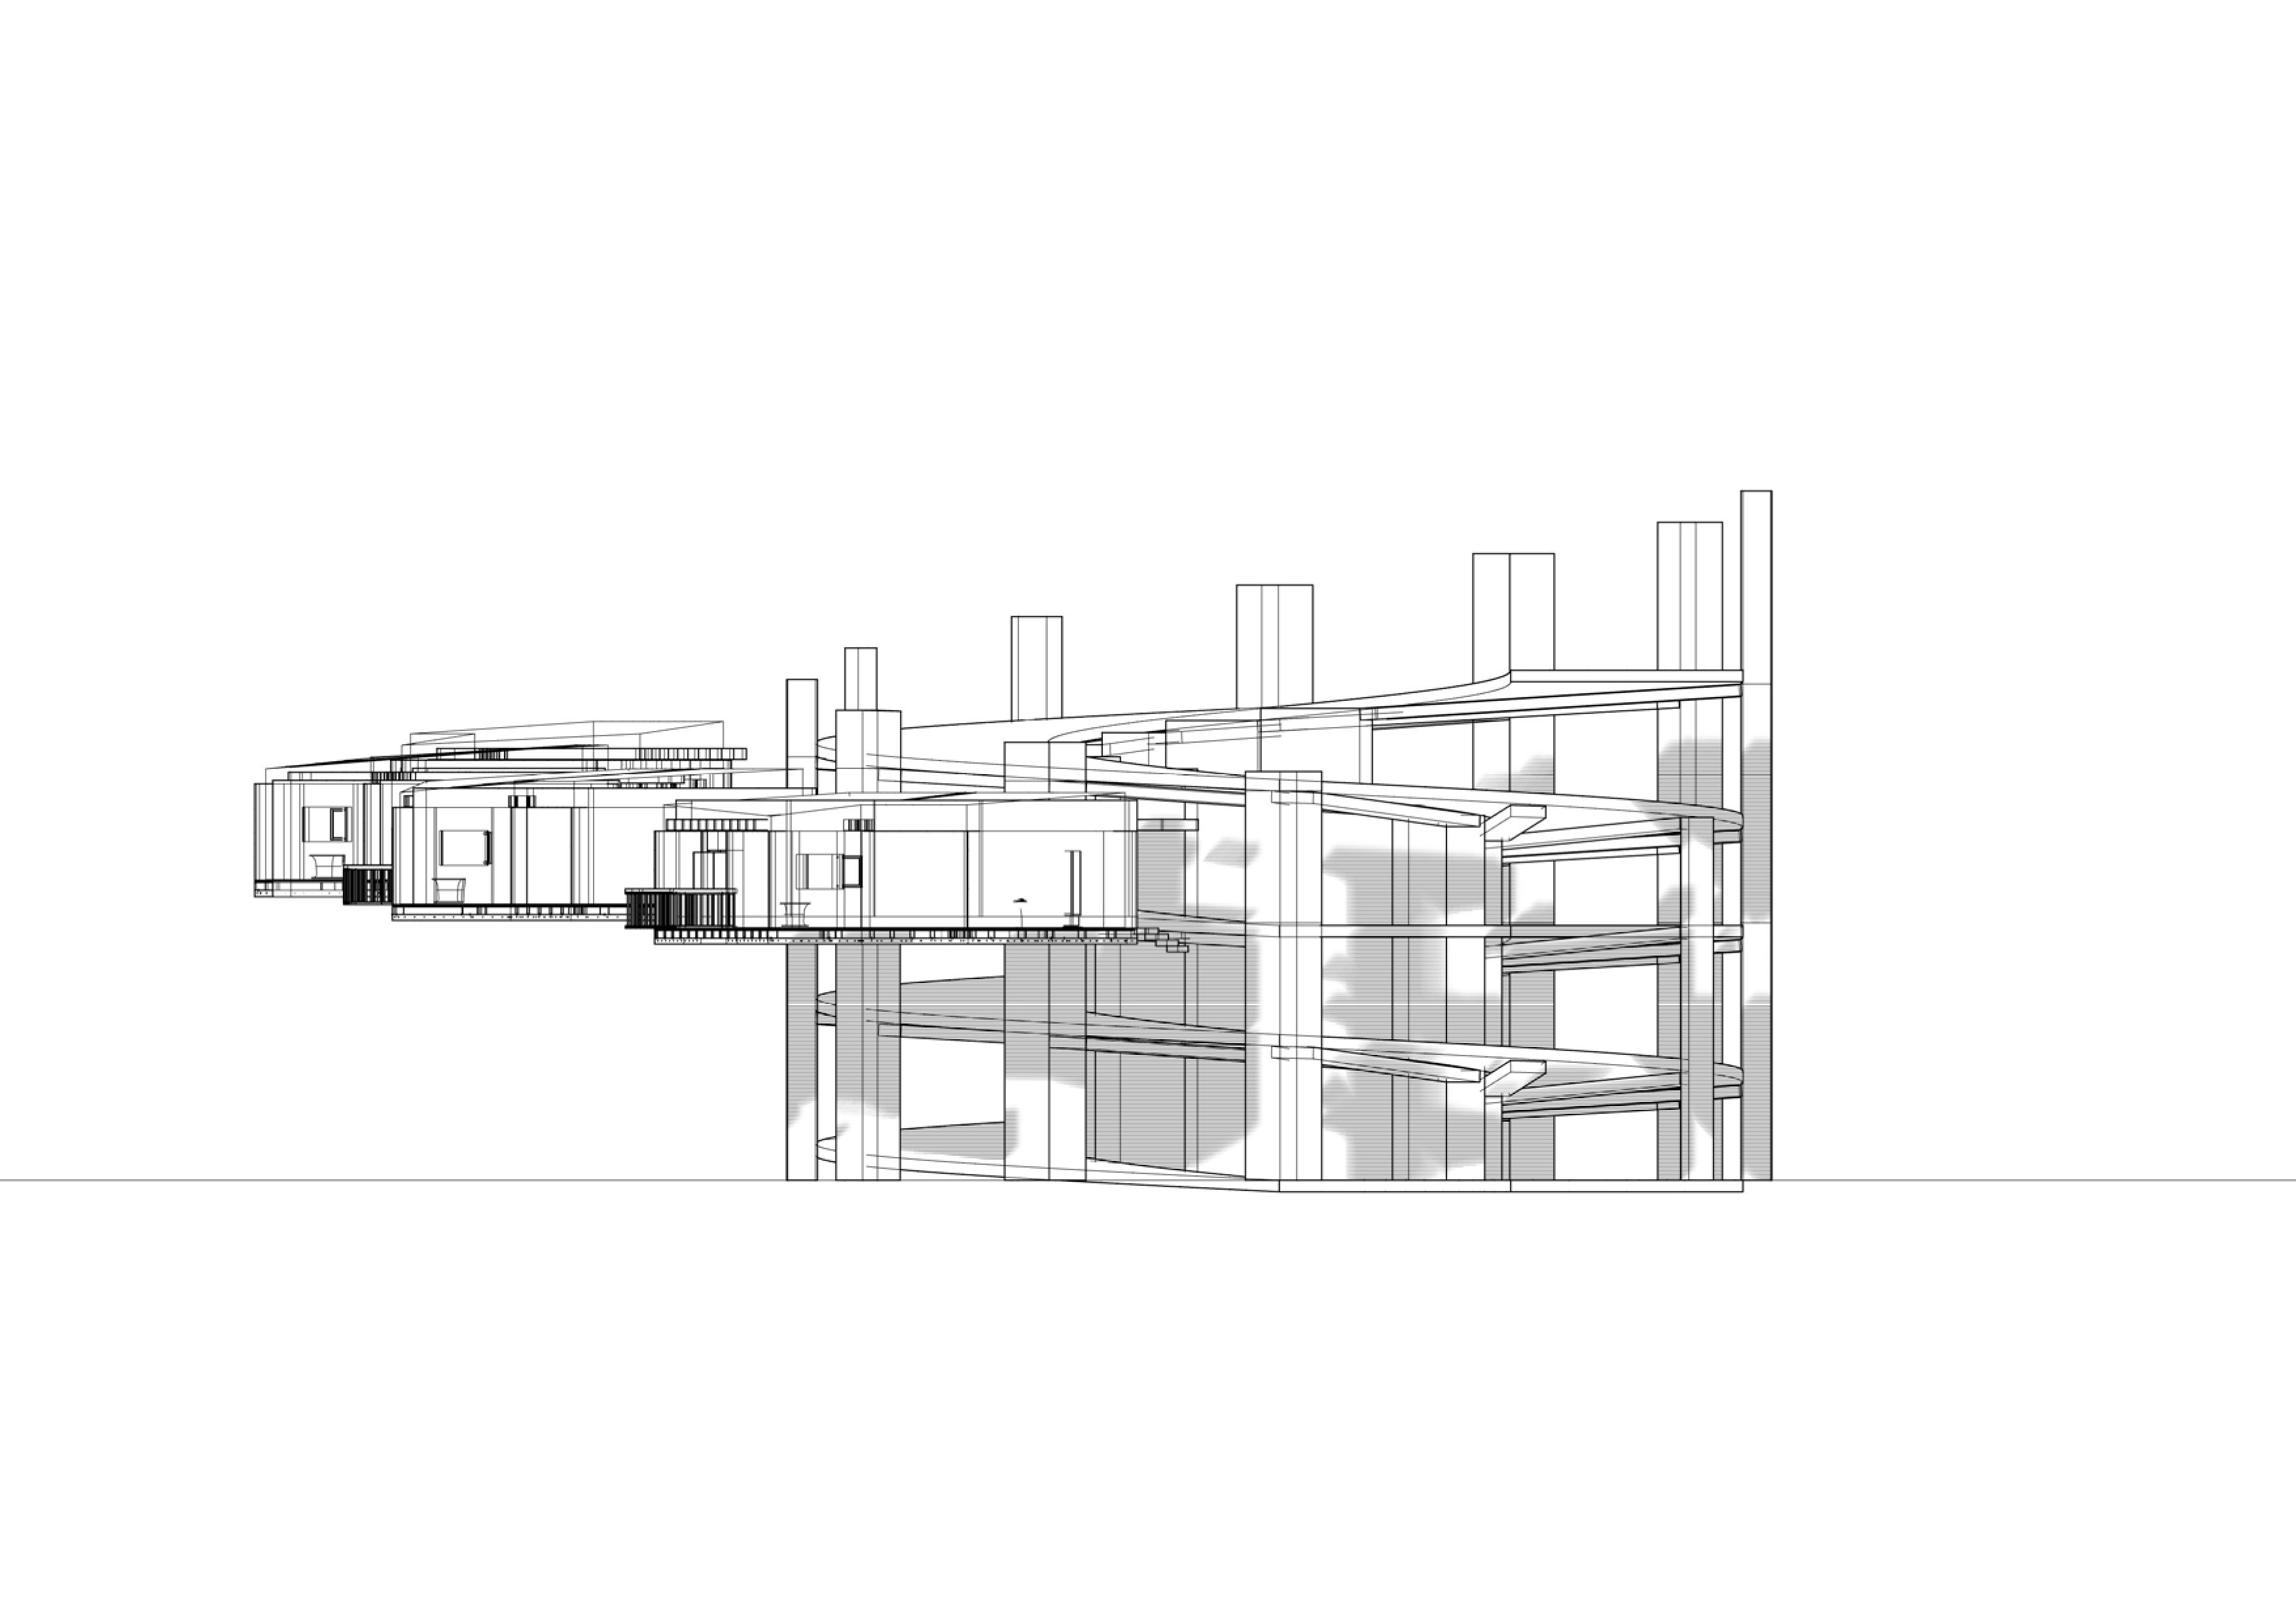 LuigiDiVitoFrancesco – BA Architecture – Year 3